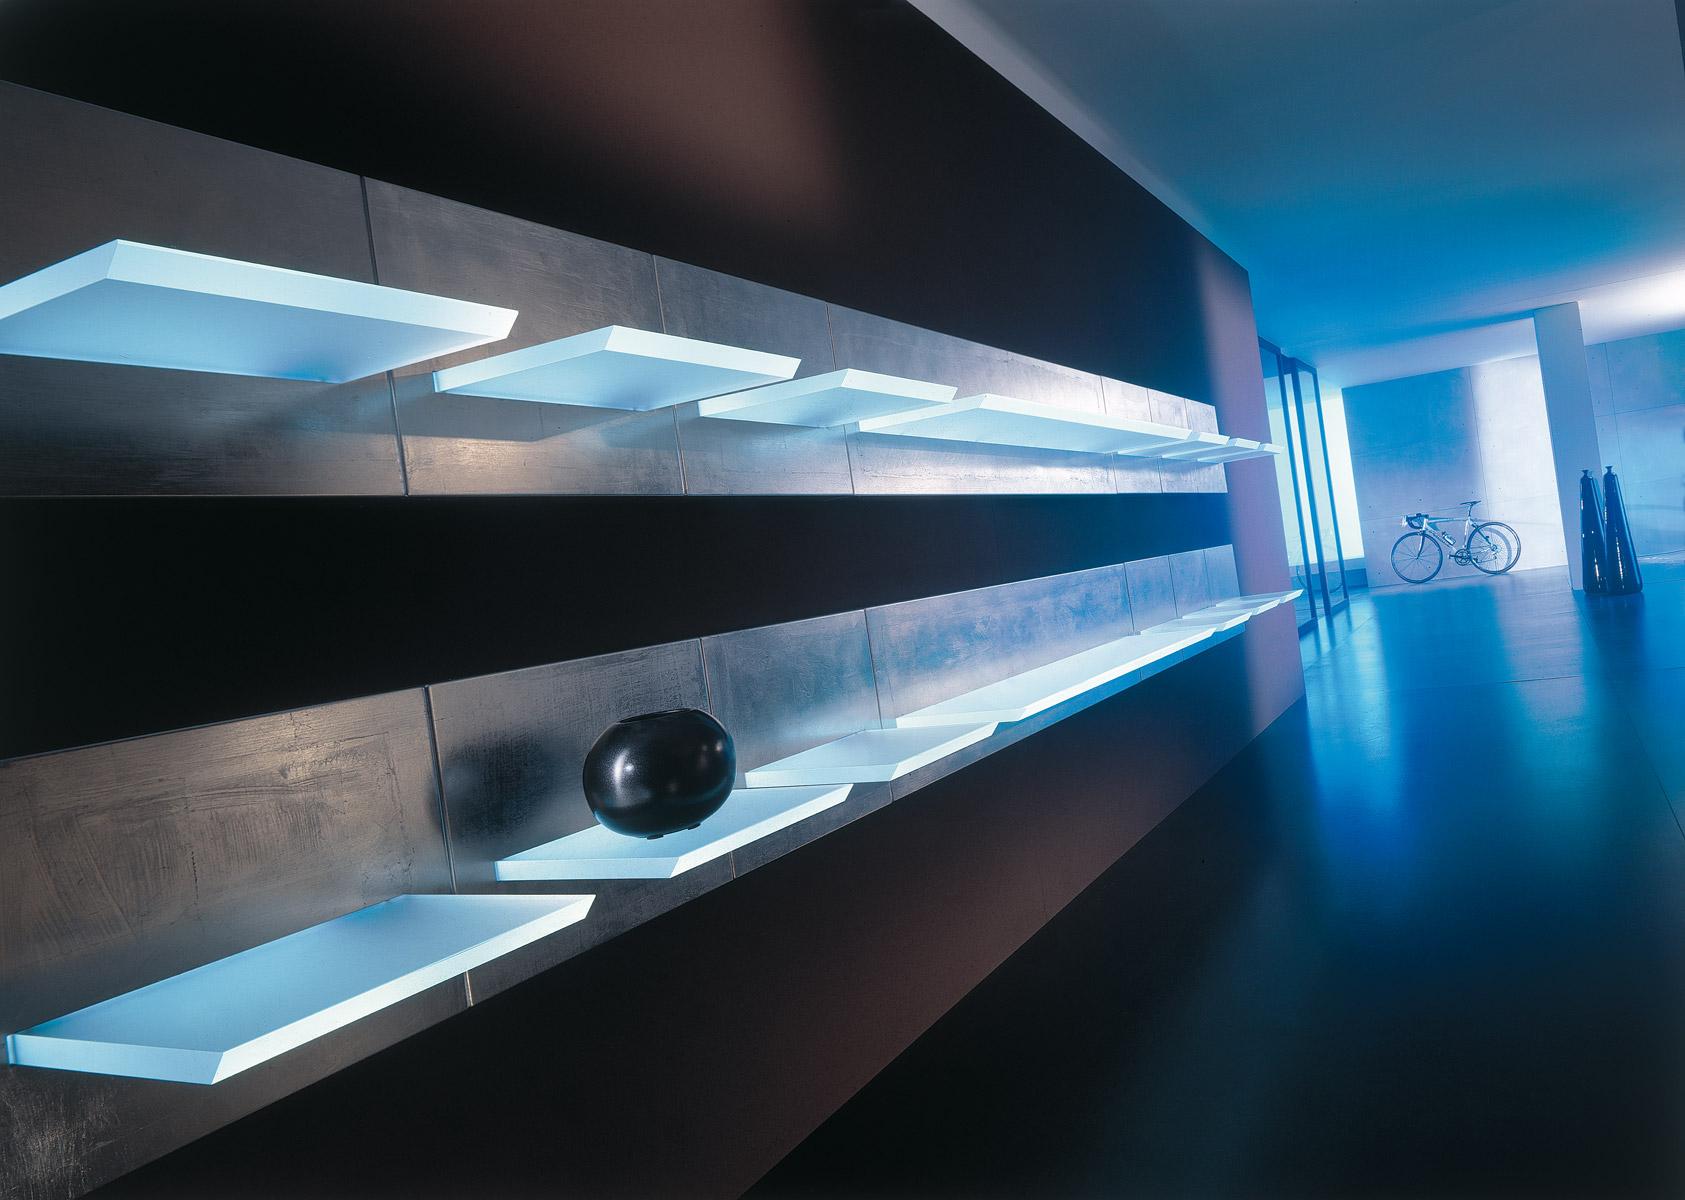 Forum arredamento.it u2022illuminazione cucina in mansarda